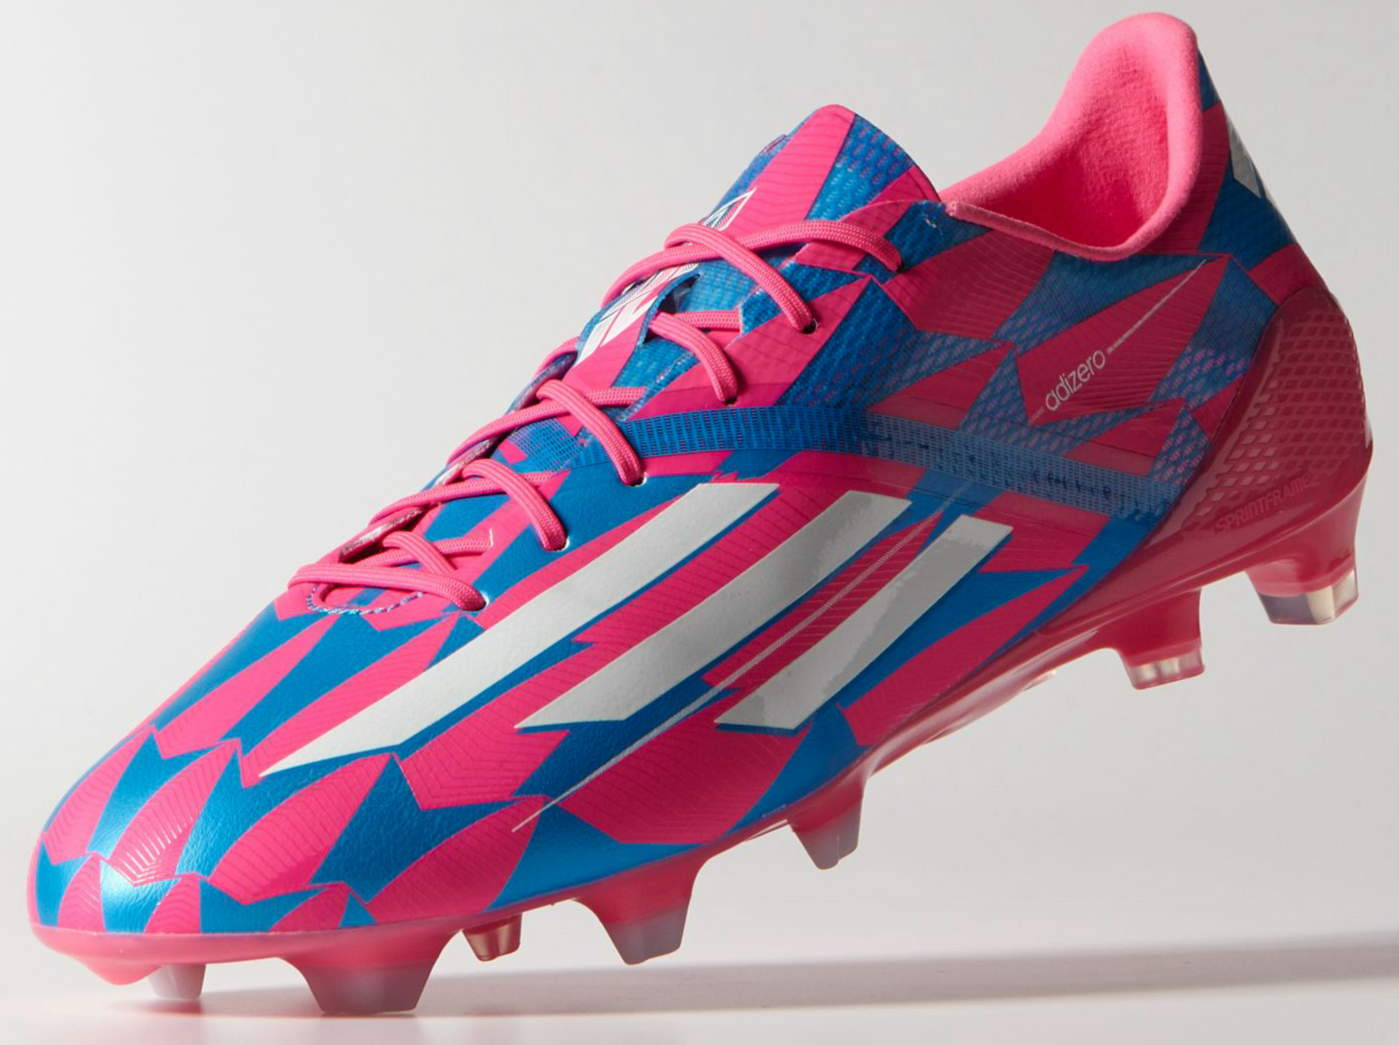 adidas boots 2014